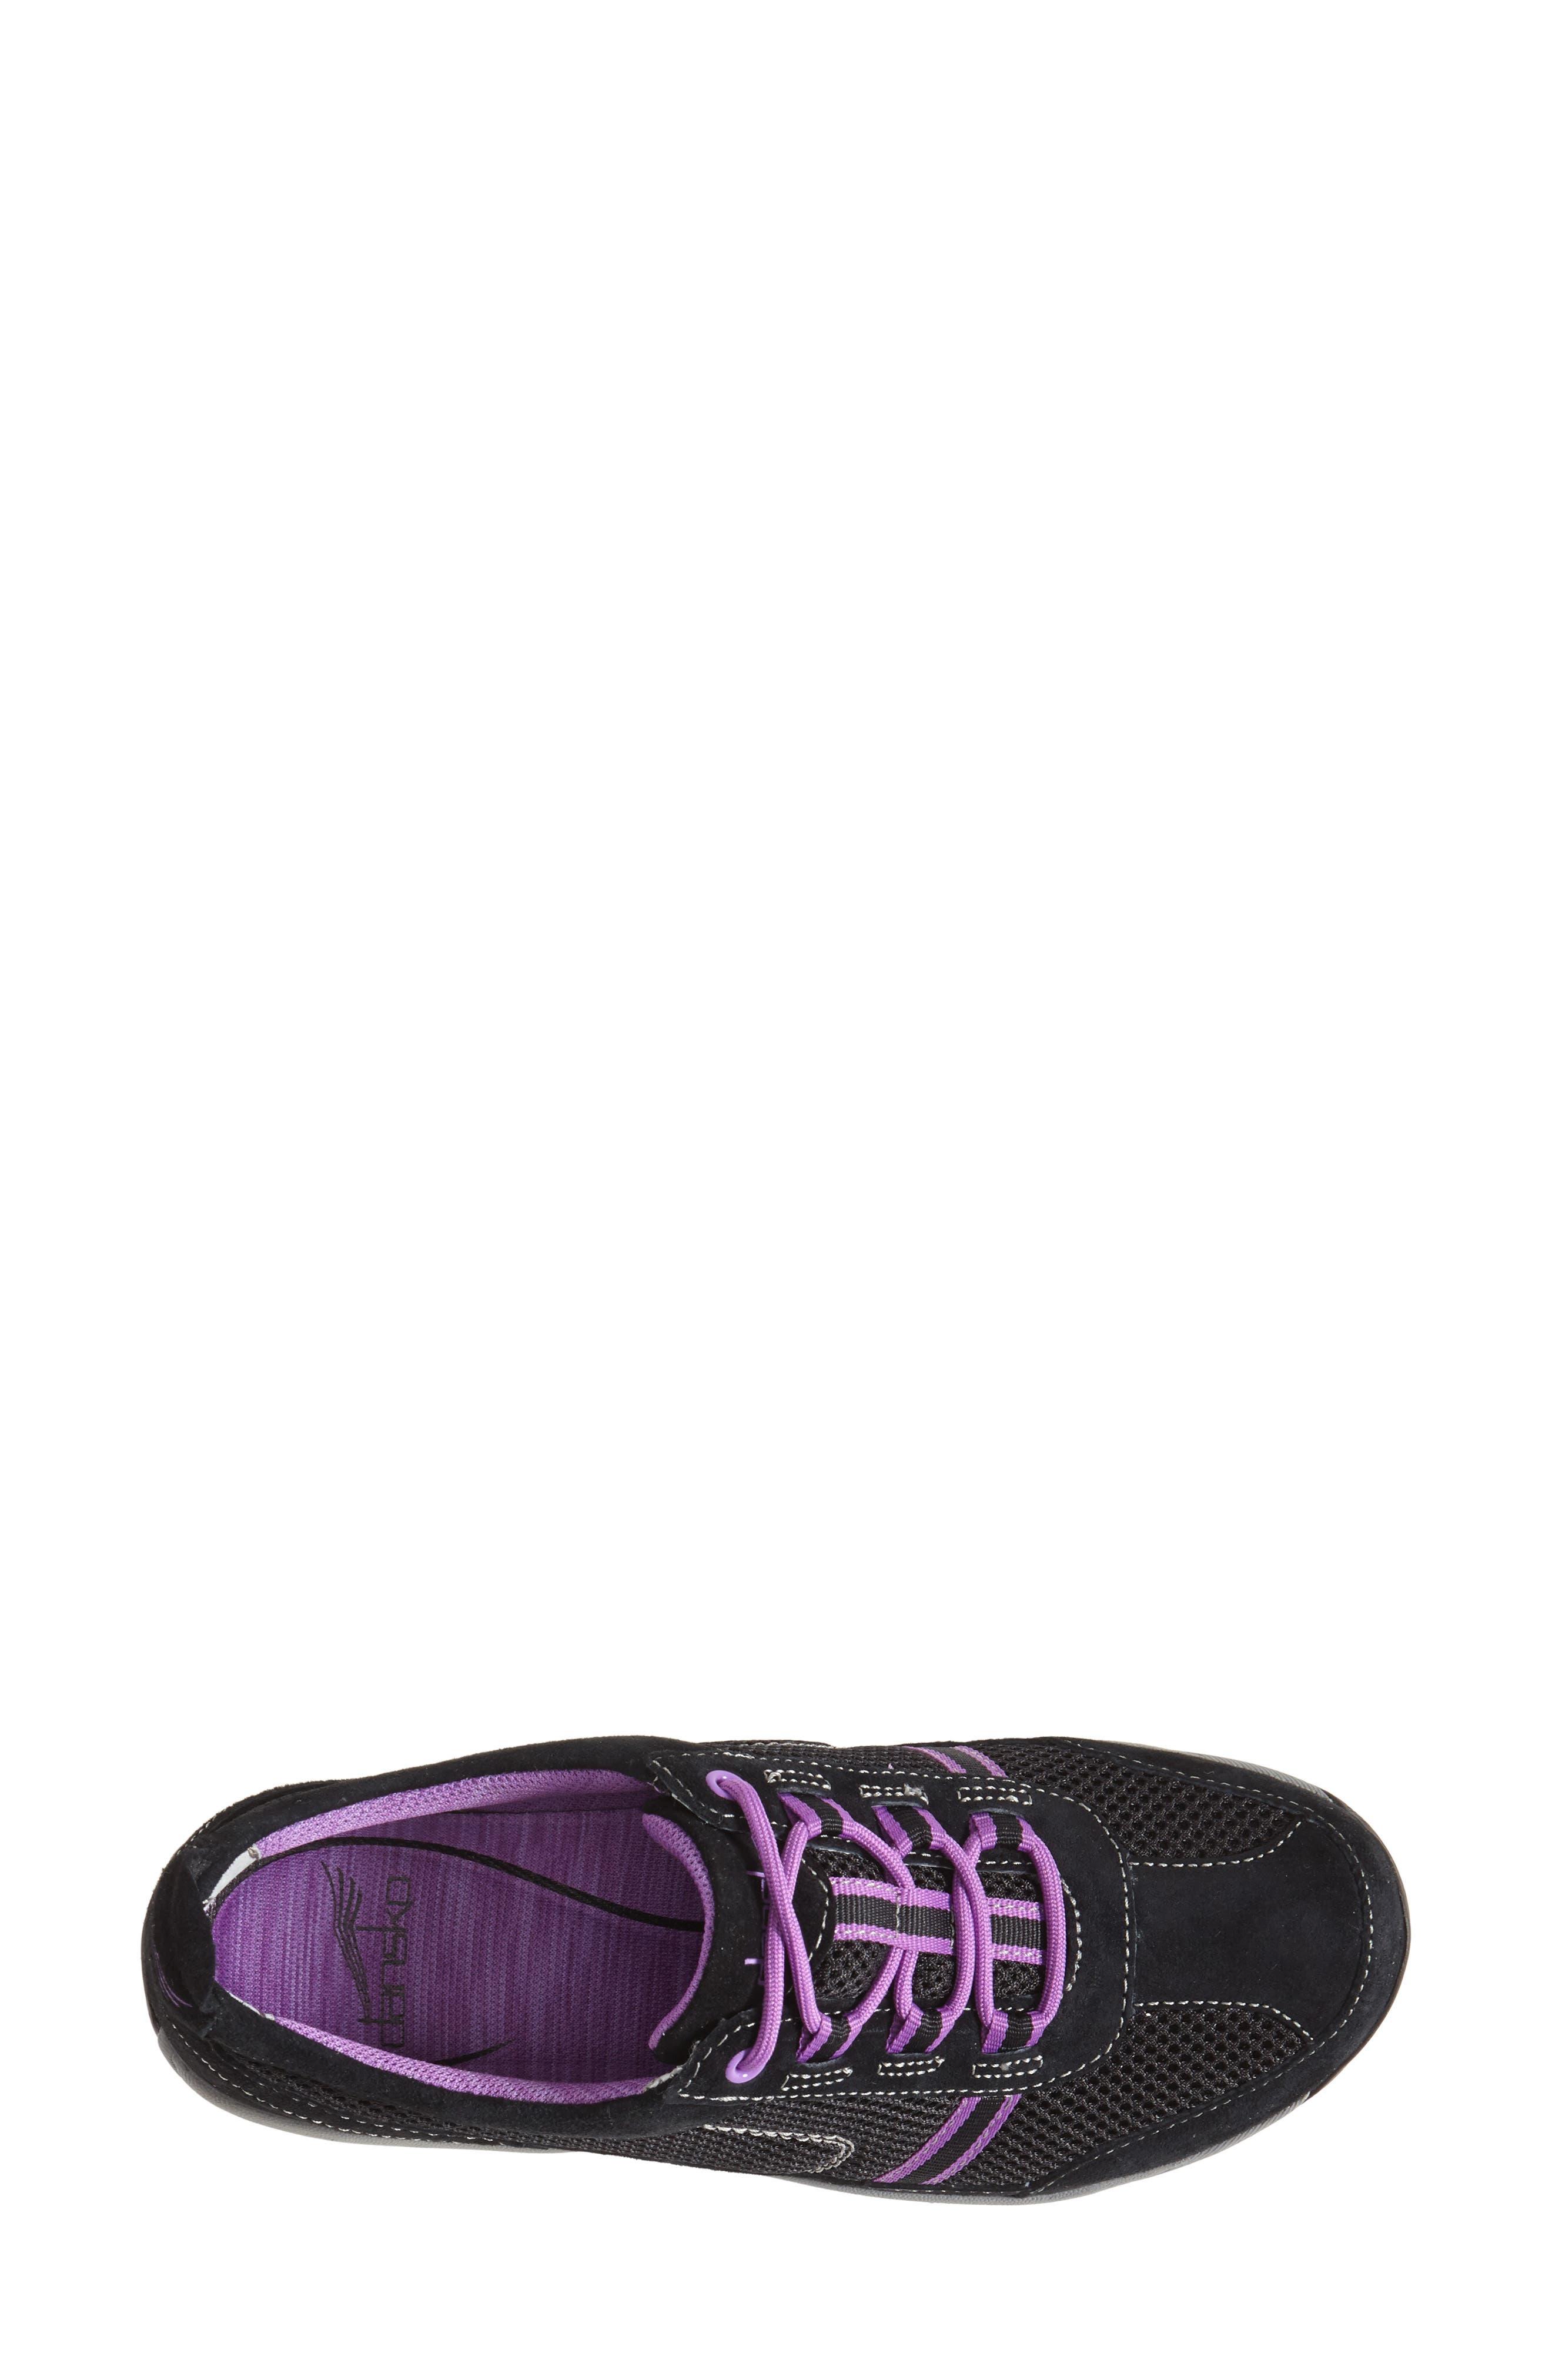 'Helen' Suede & Mesh Sneaker,                             Alternate thumbnail 17, color,